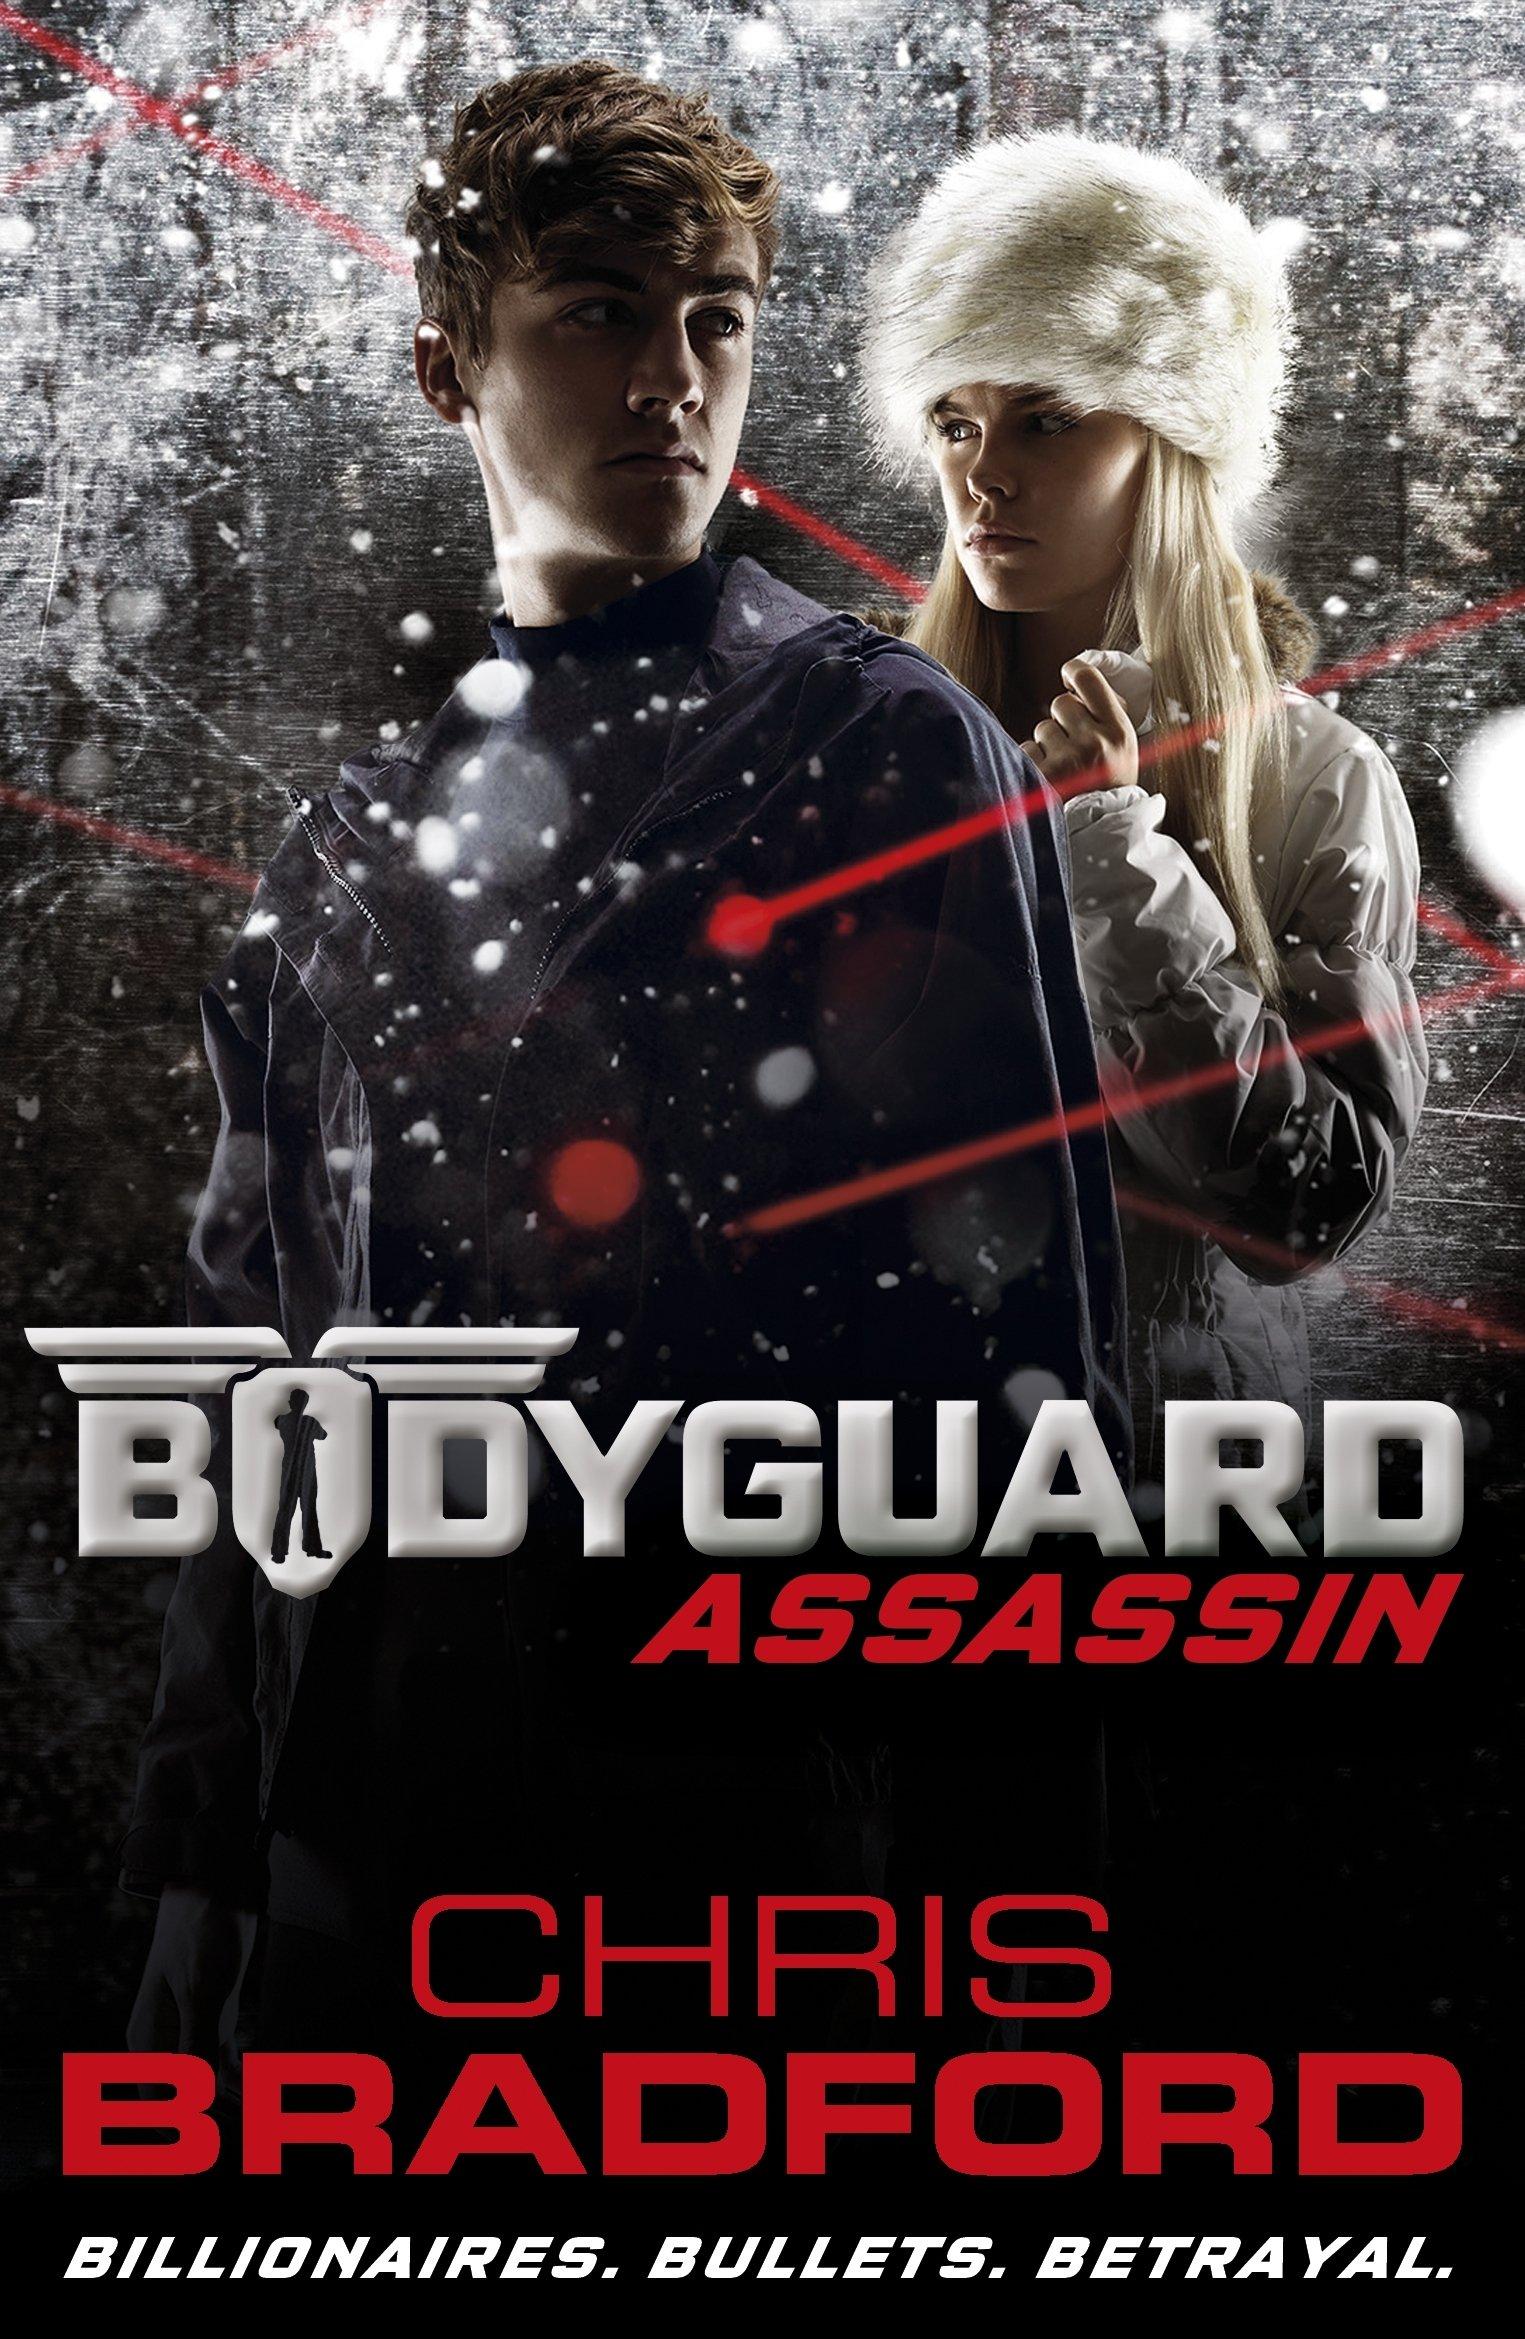 Bodyguard: Assassin (Book 5): CHRIS BRADFORD: 9780141359502 ...